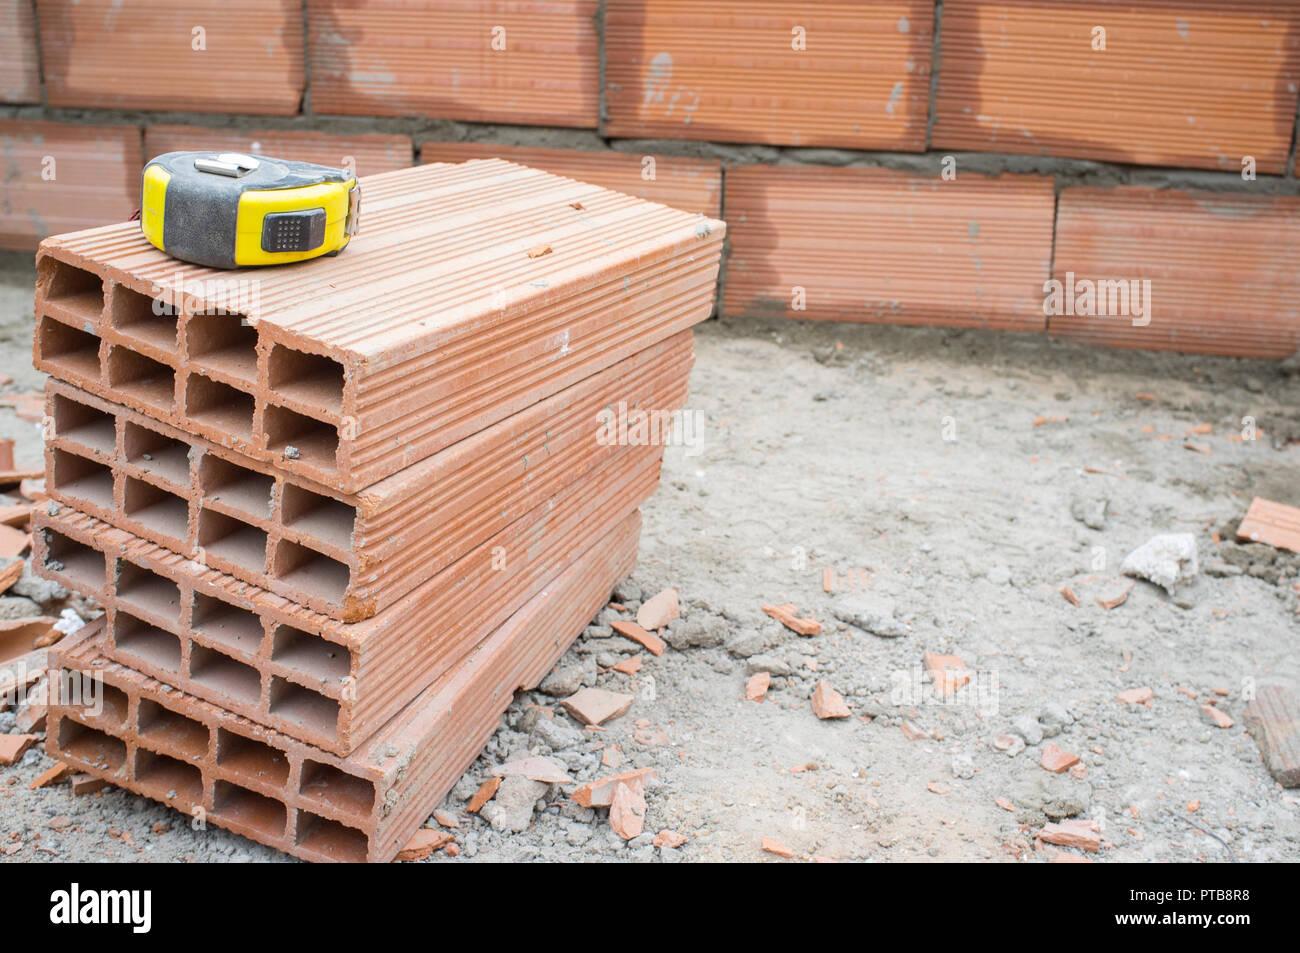 Measuring tape over clay-based bricks. Closeup - Stock Image